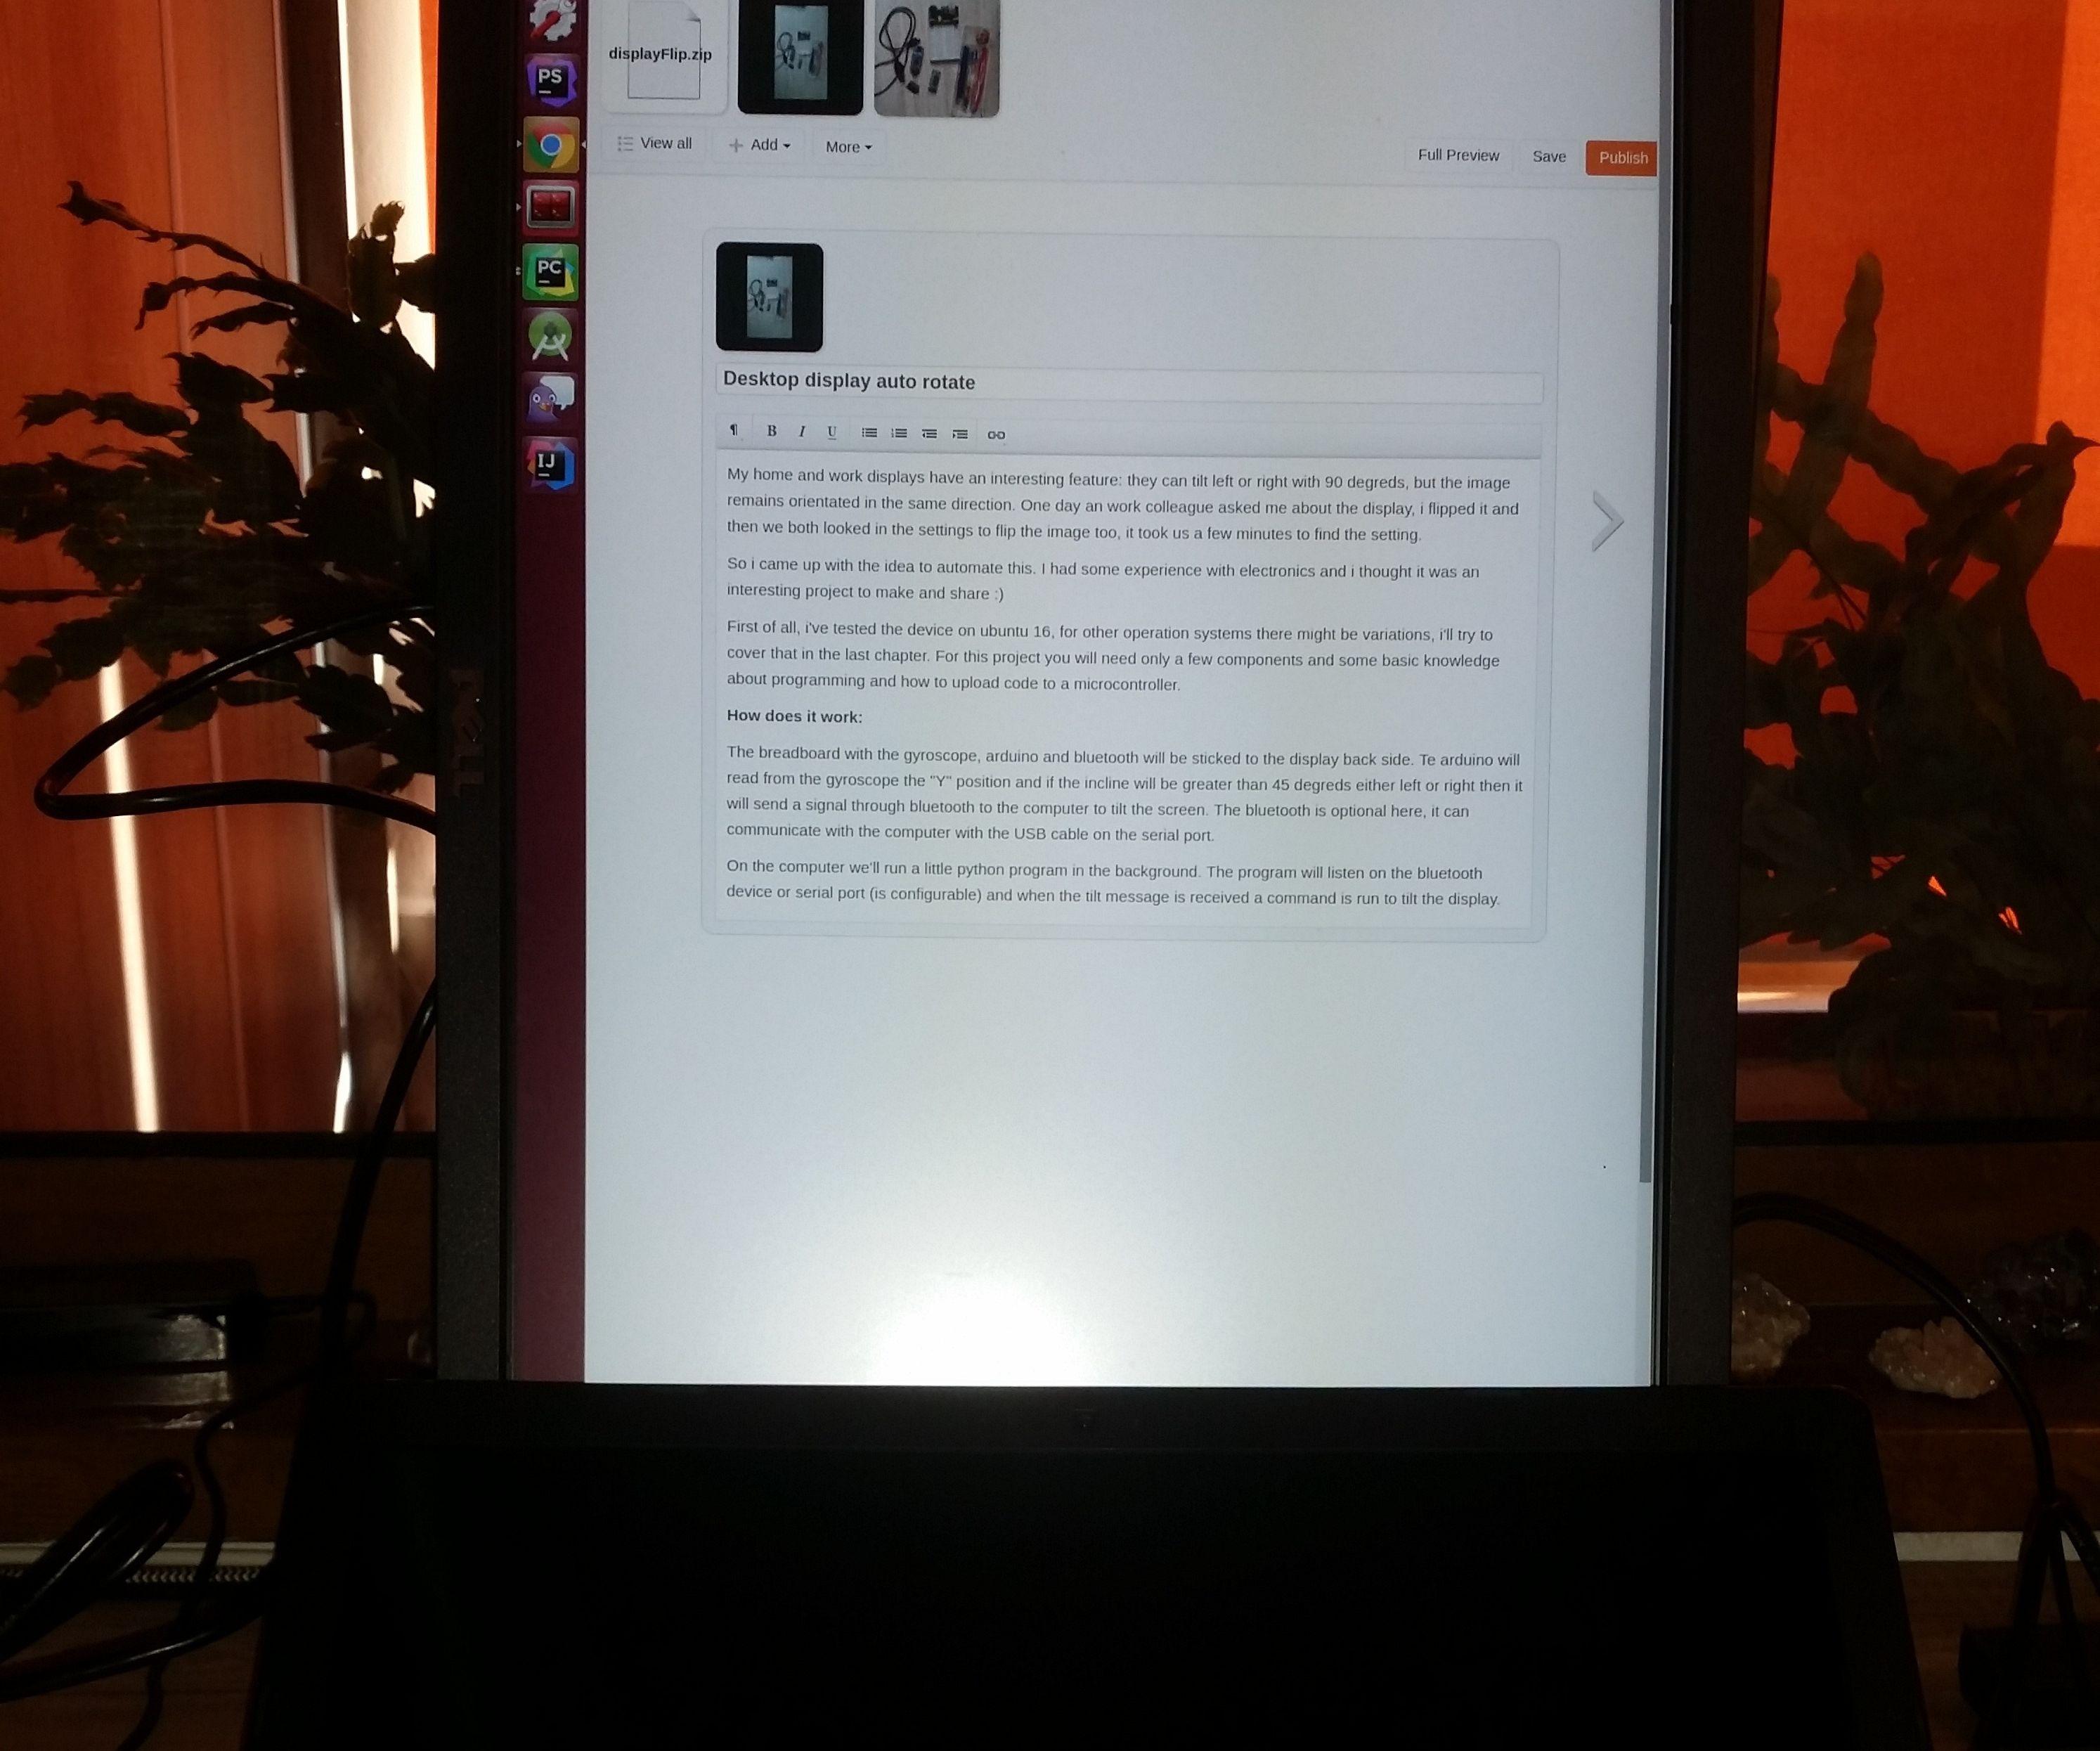 Desktop Display Auto Rotate: 4 Steps